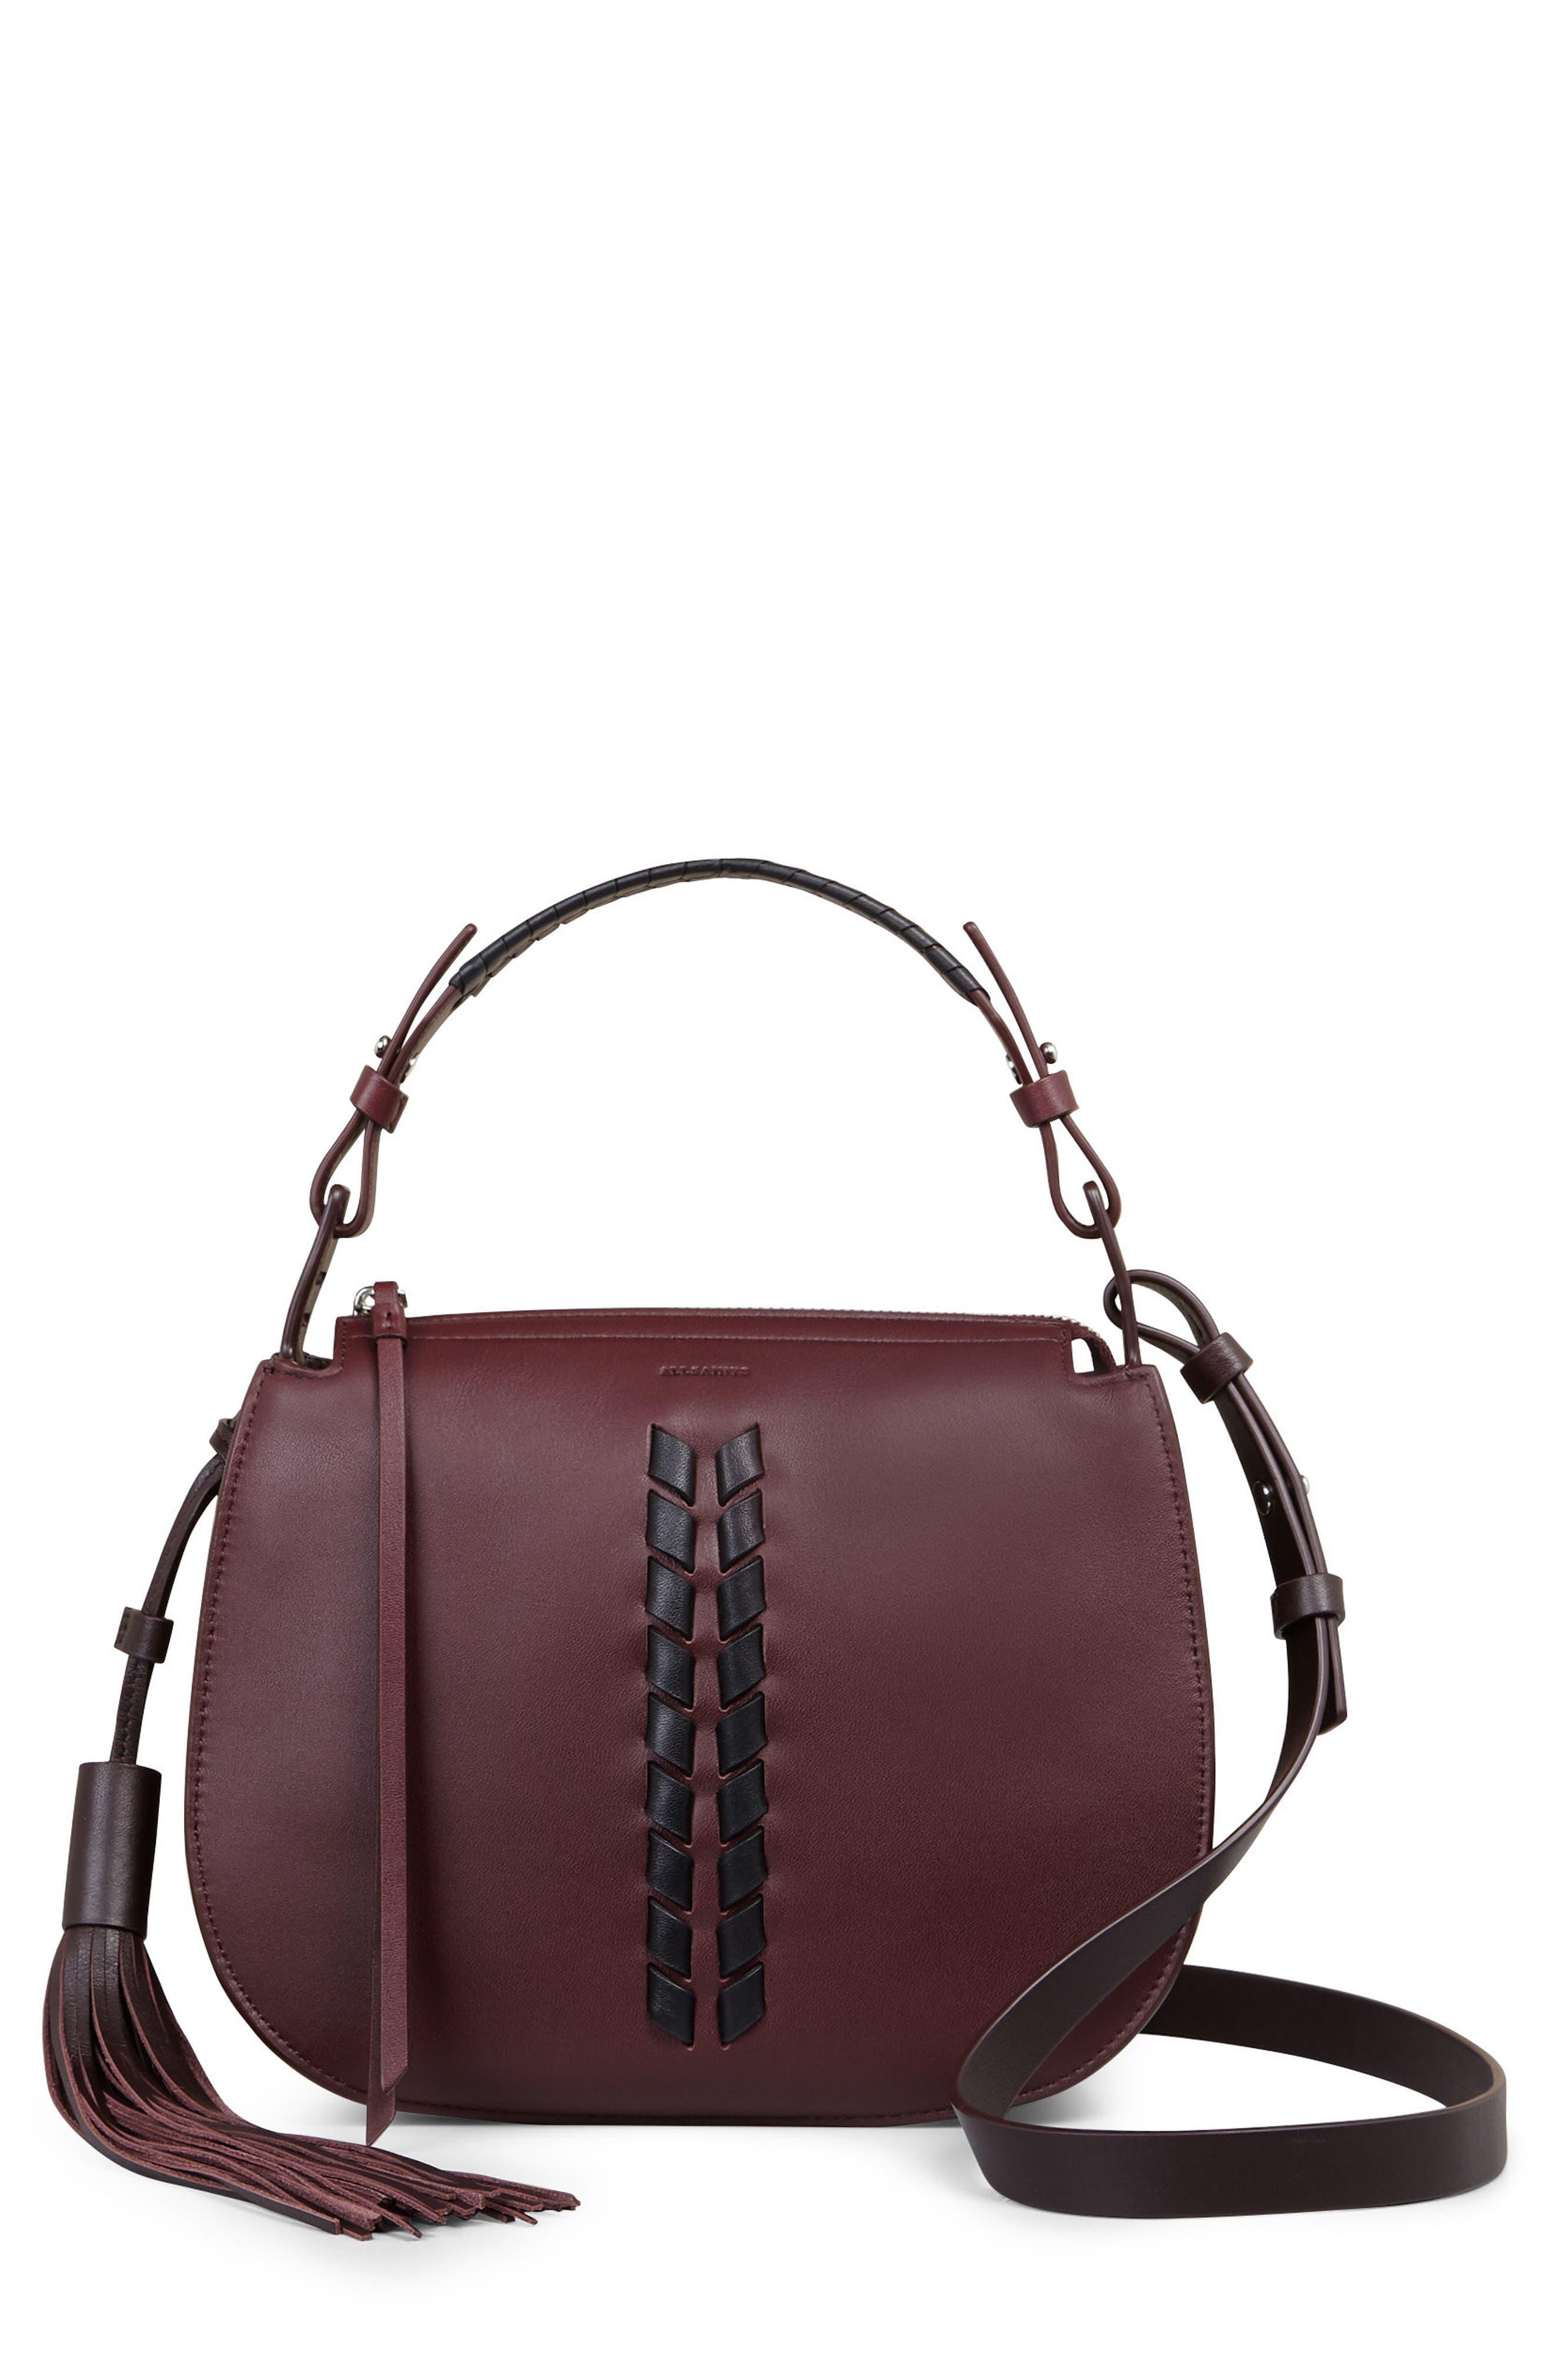 Red Handbags On Sale